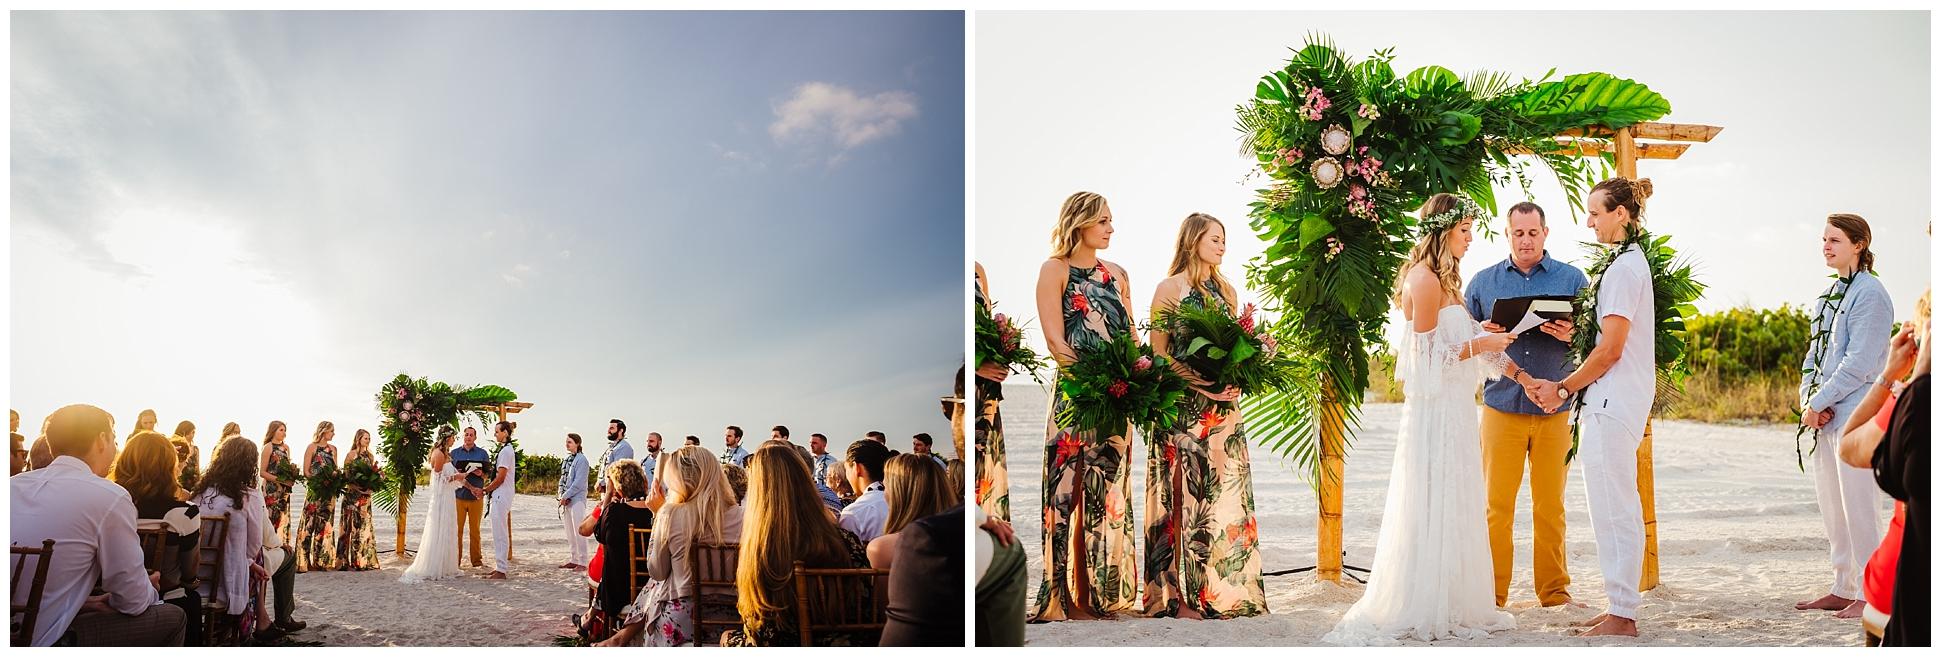 tampa-bay-wedding-photographer-barefoot-post-card-inn-tropical-hawaiin-lei-pink-pineapples-flower-crown_0174.jpg